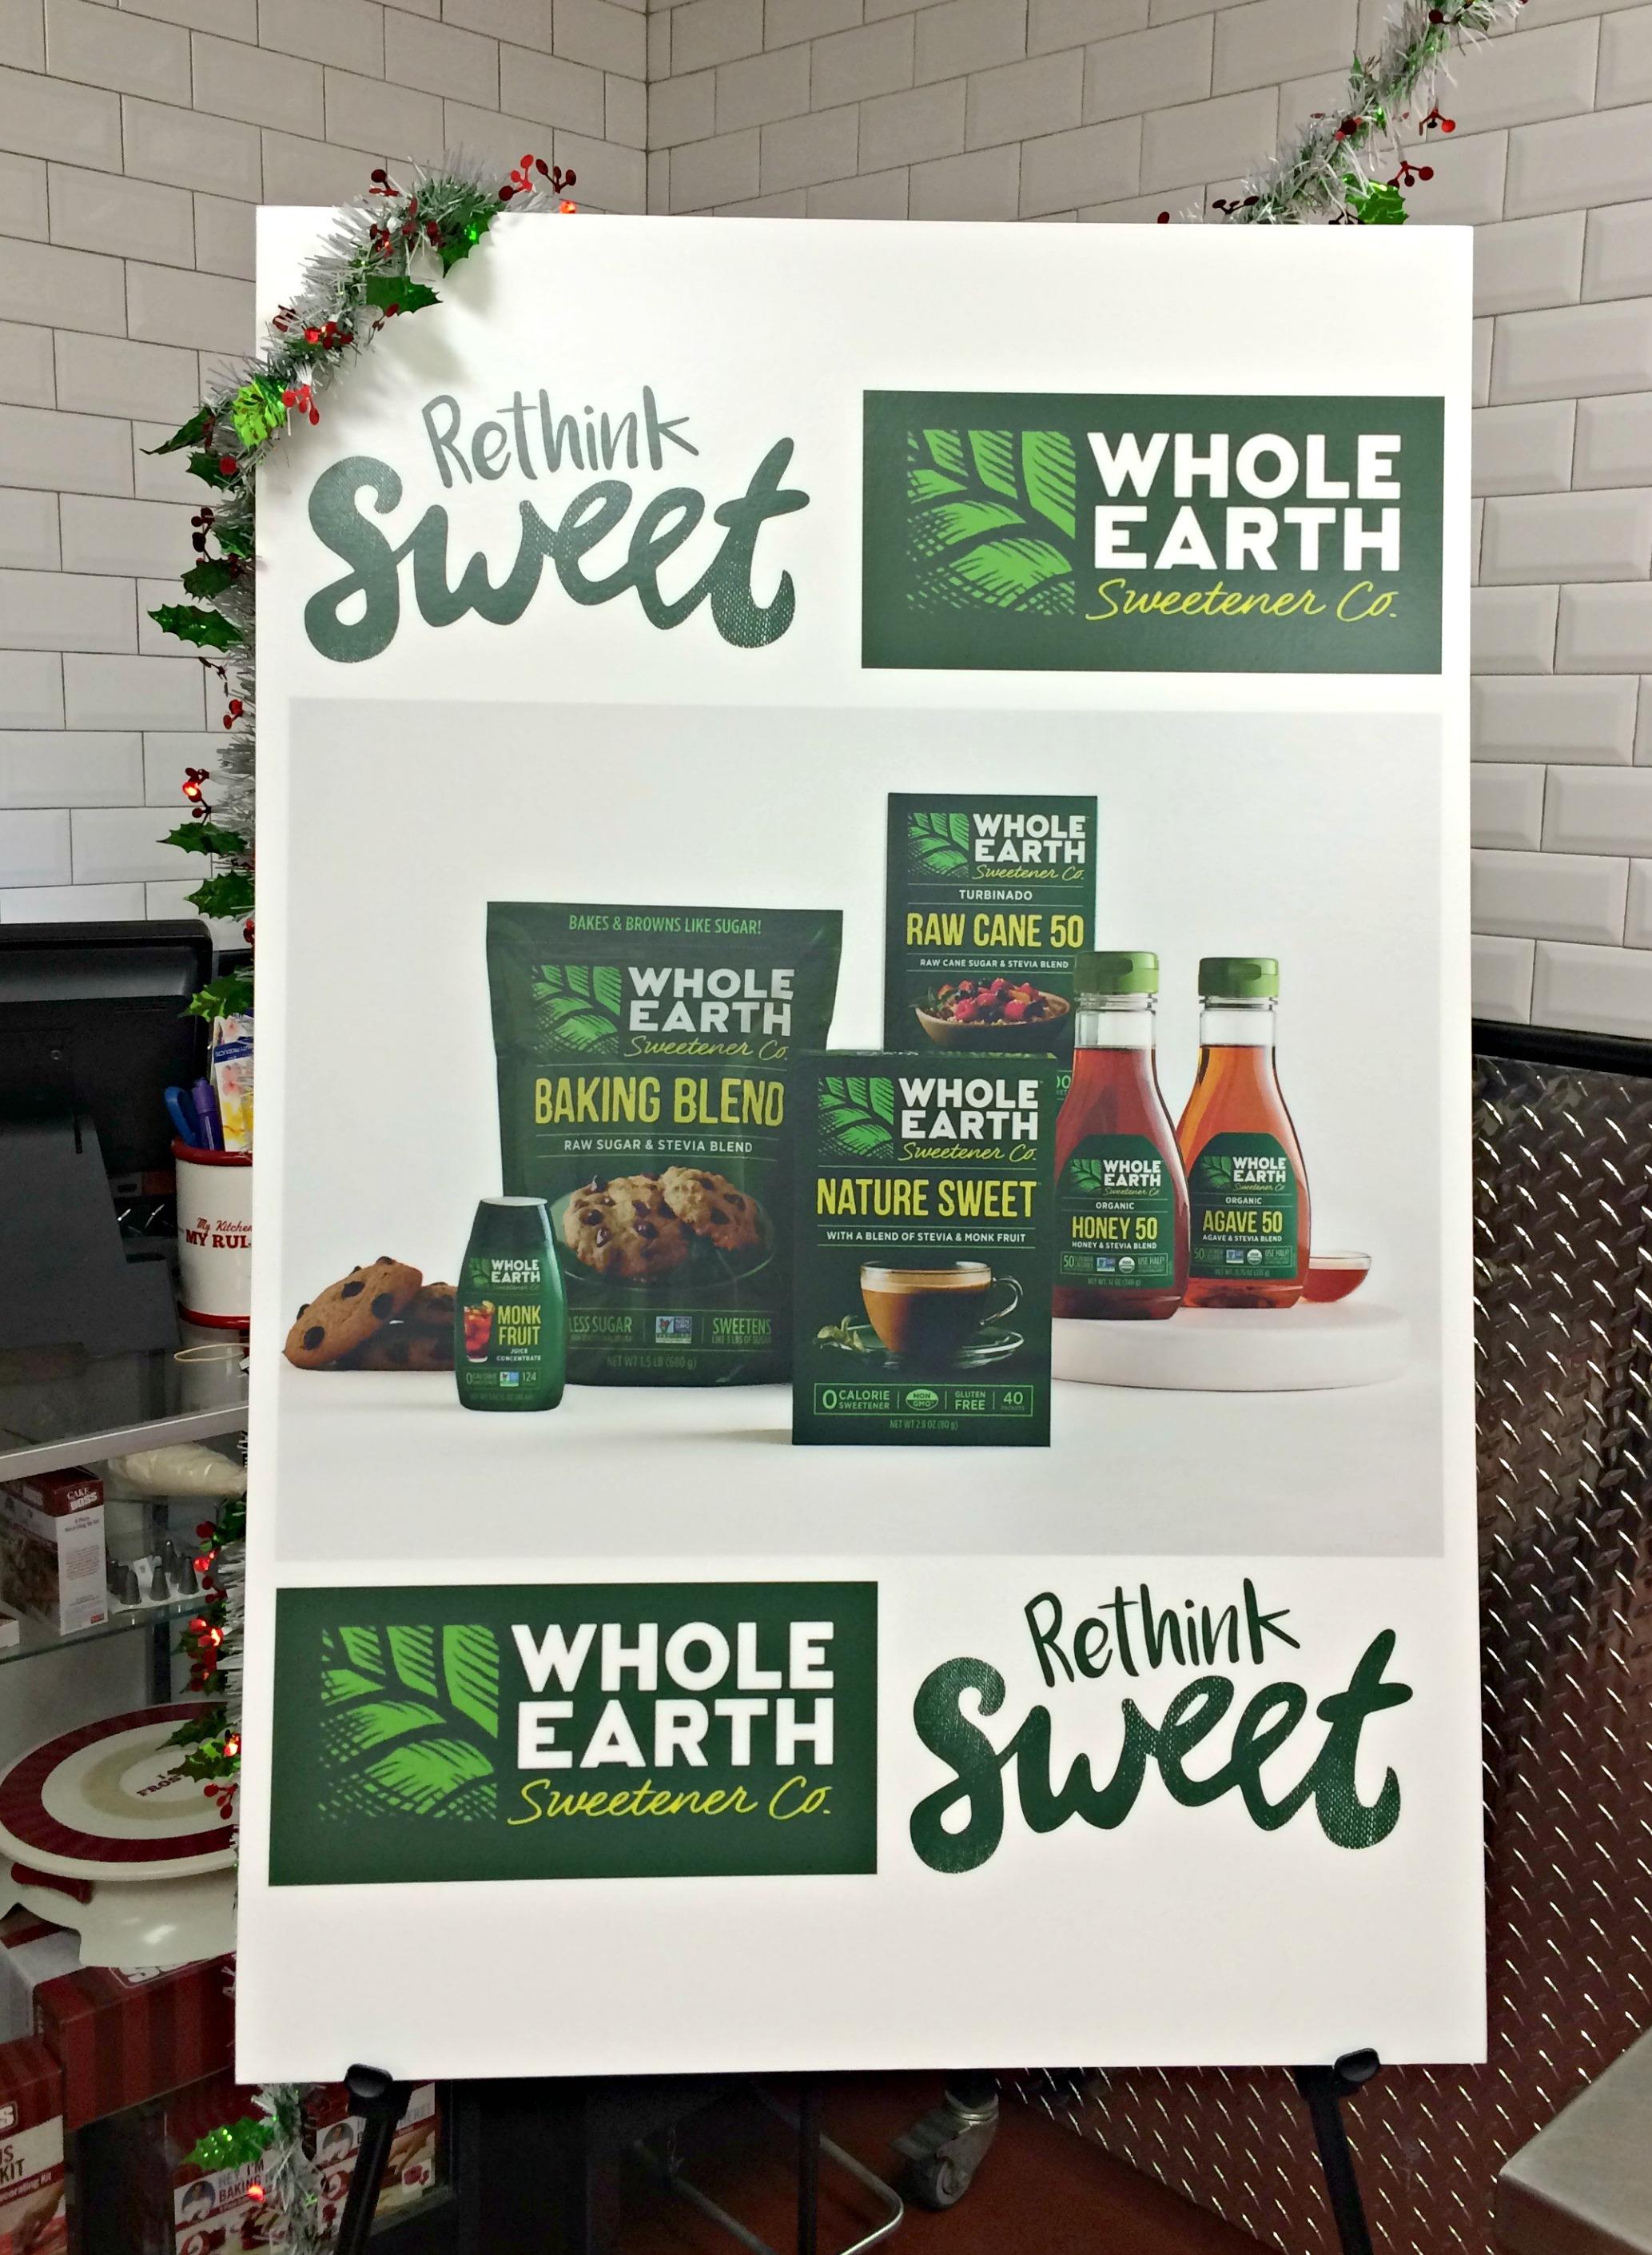 rethink-sweet-whole-earth-sweetener-co